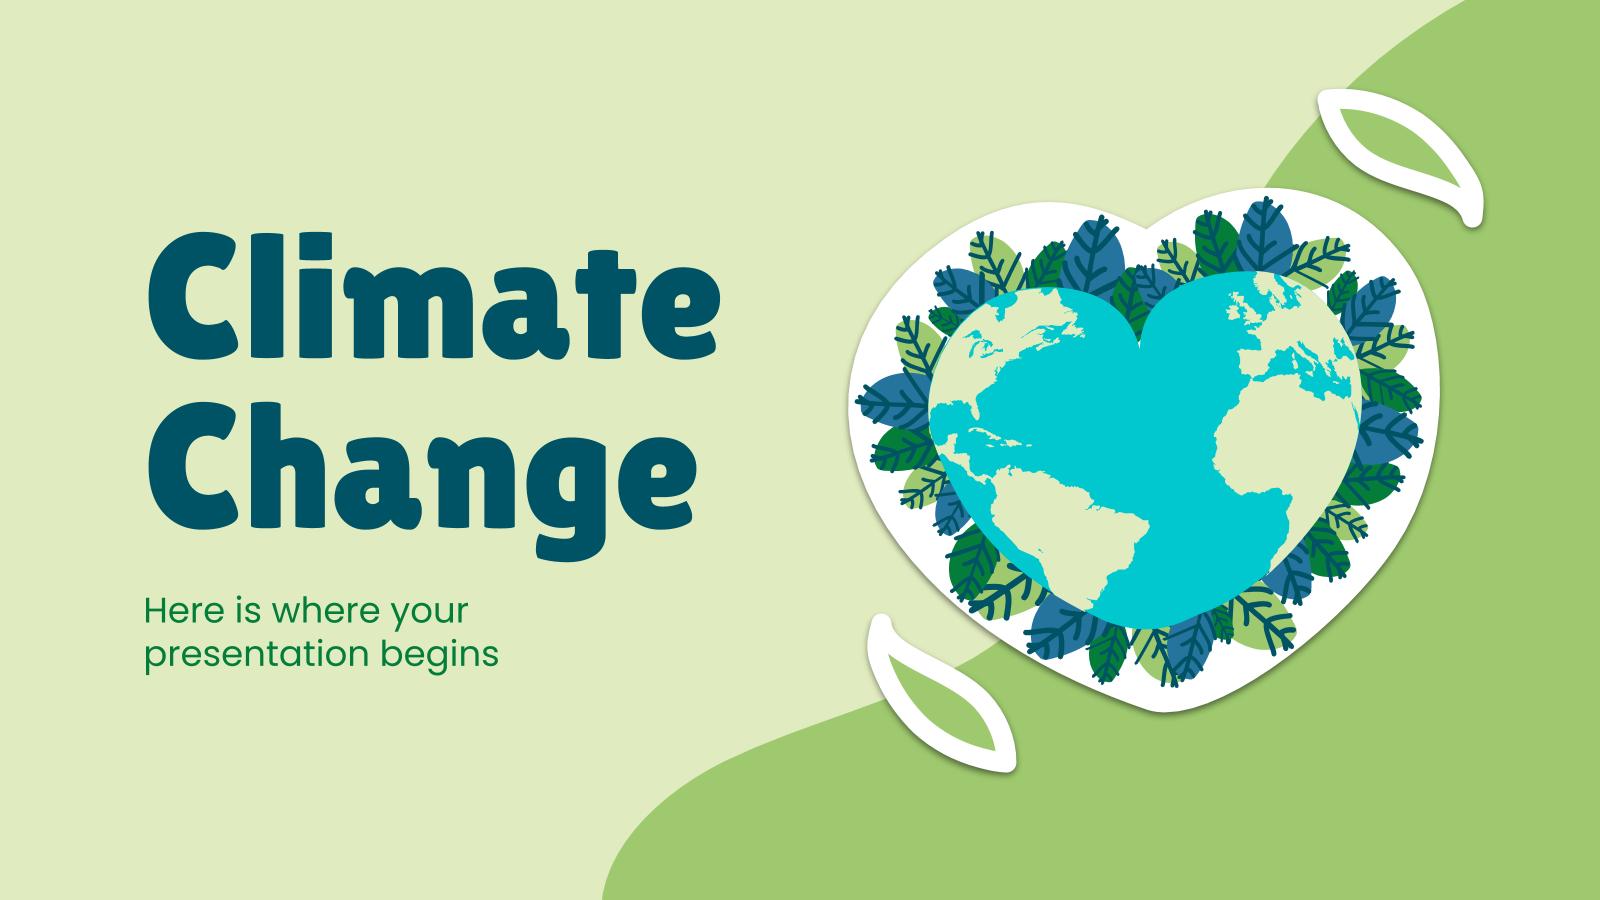 Plantilla de presentación Cambio climático